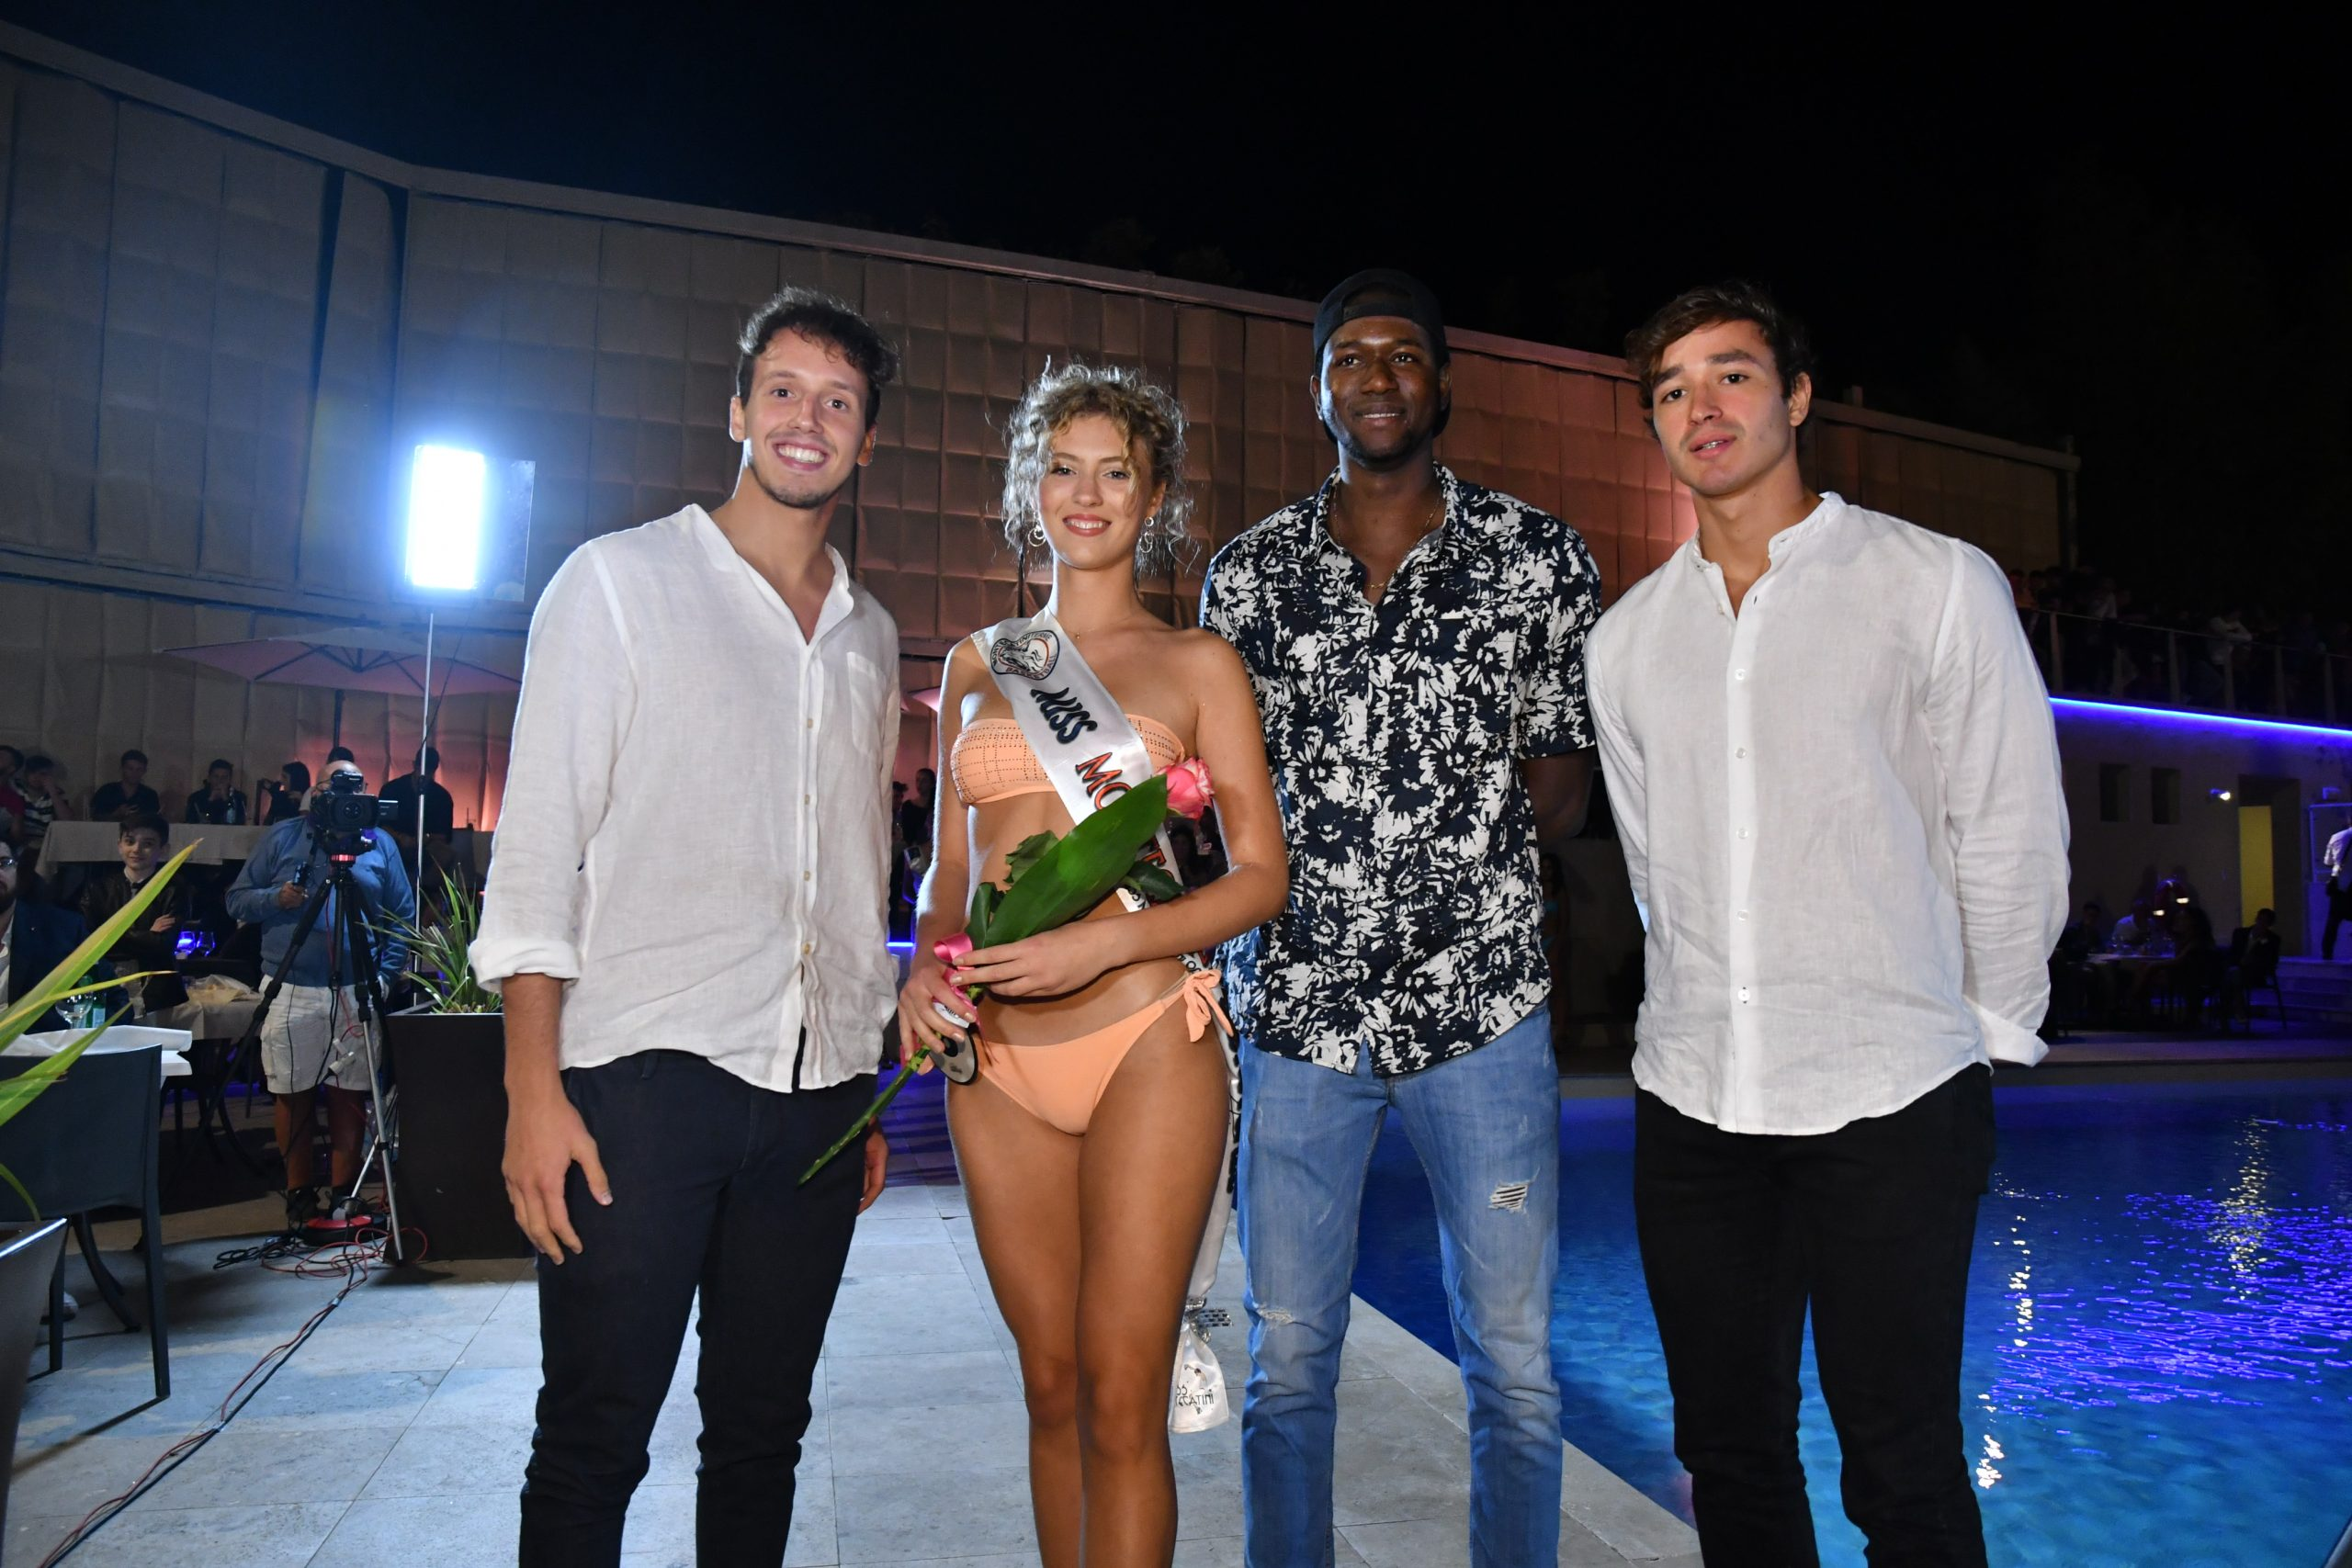 Alia Marano Miss Montecatiniterme Basketball 2021